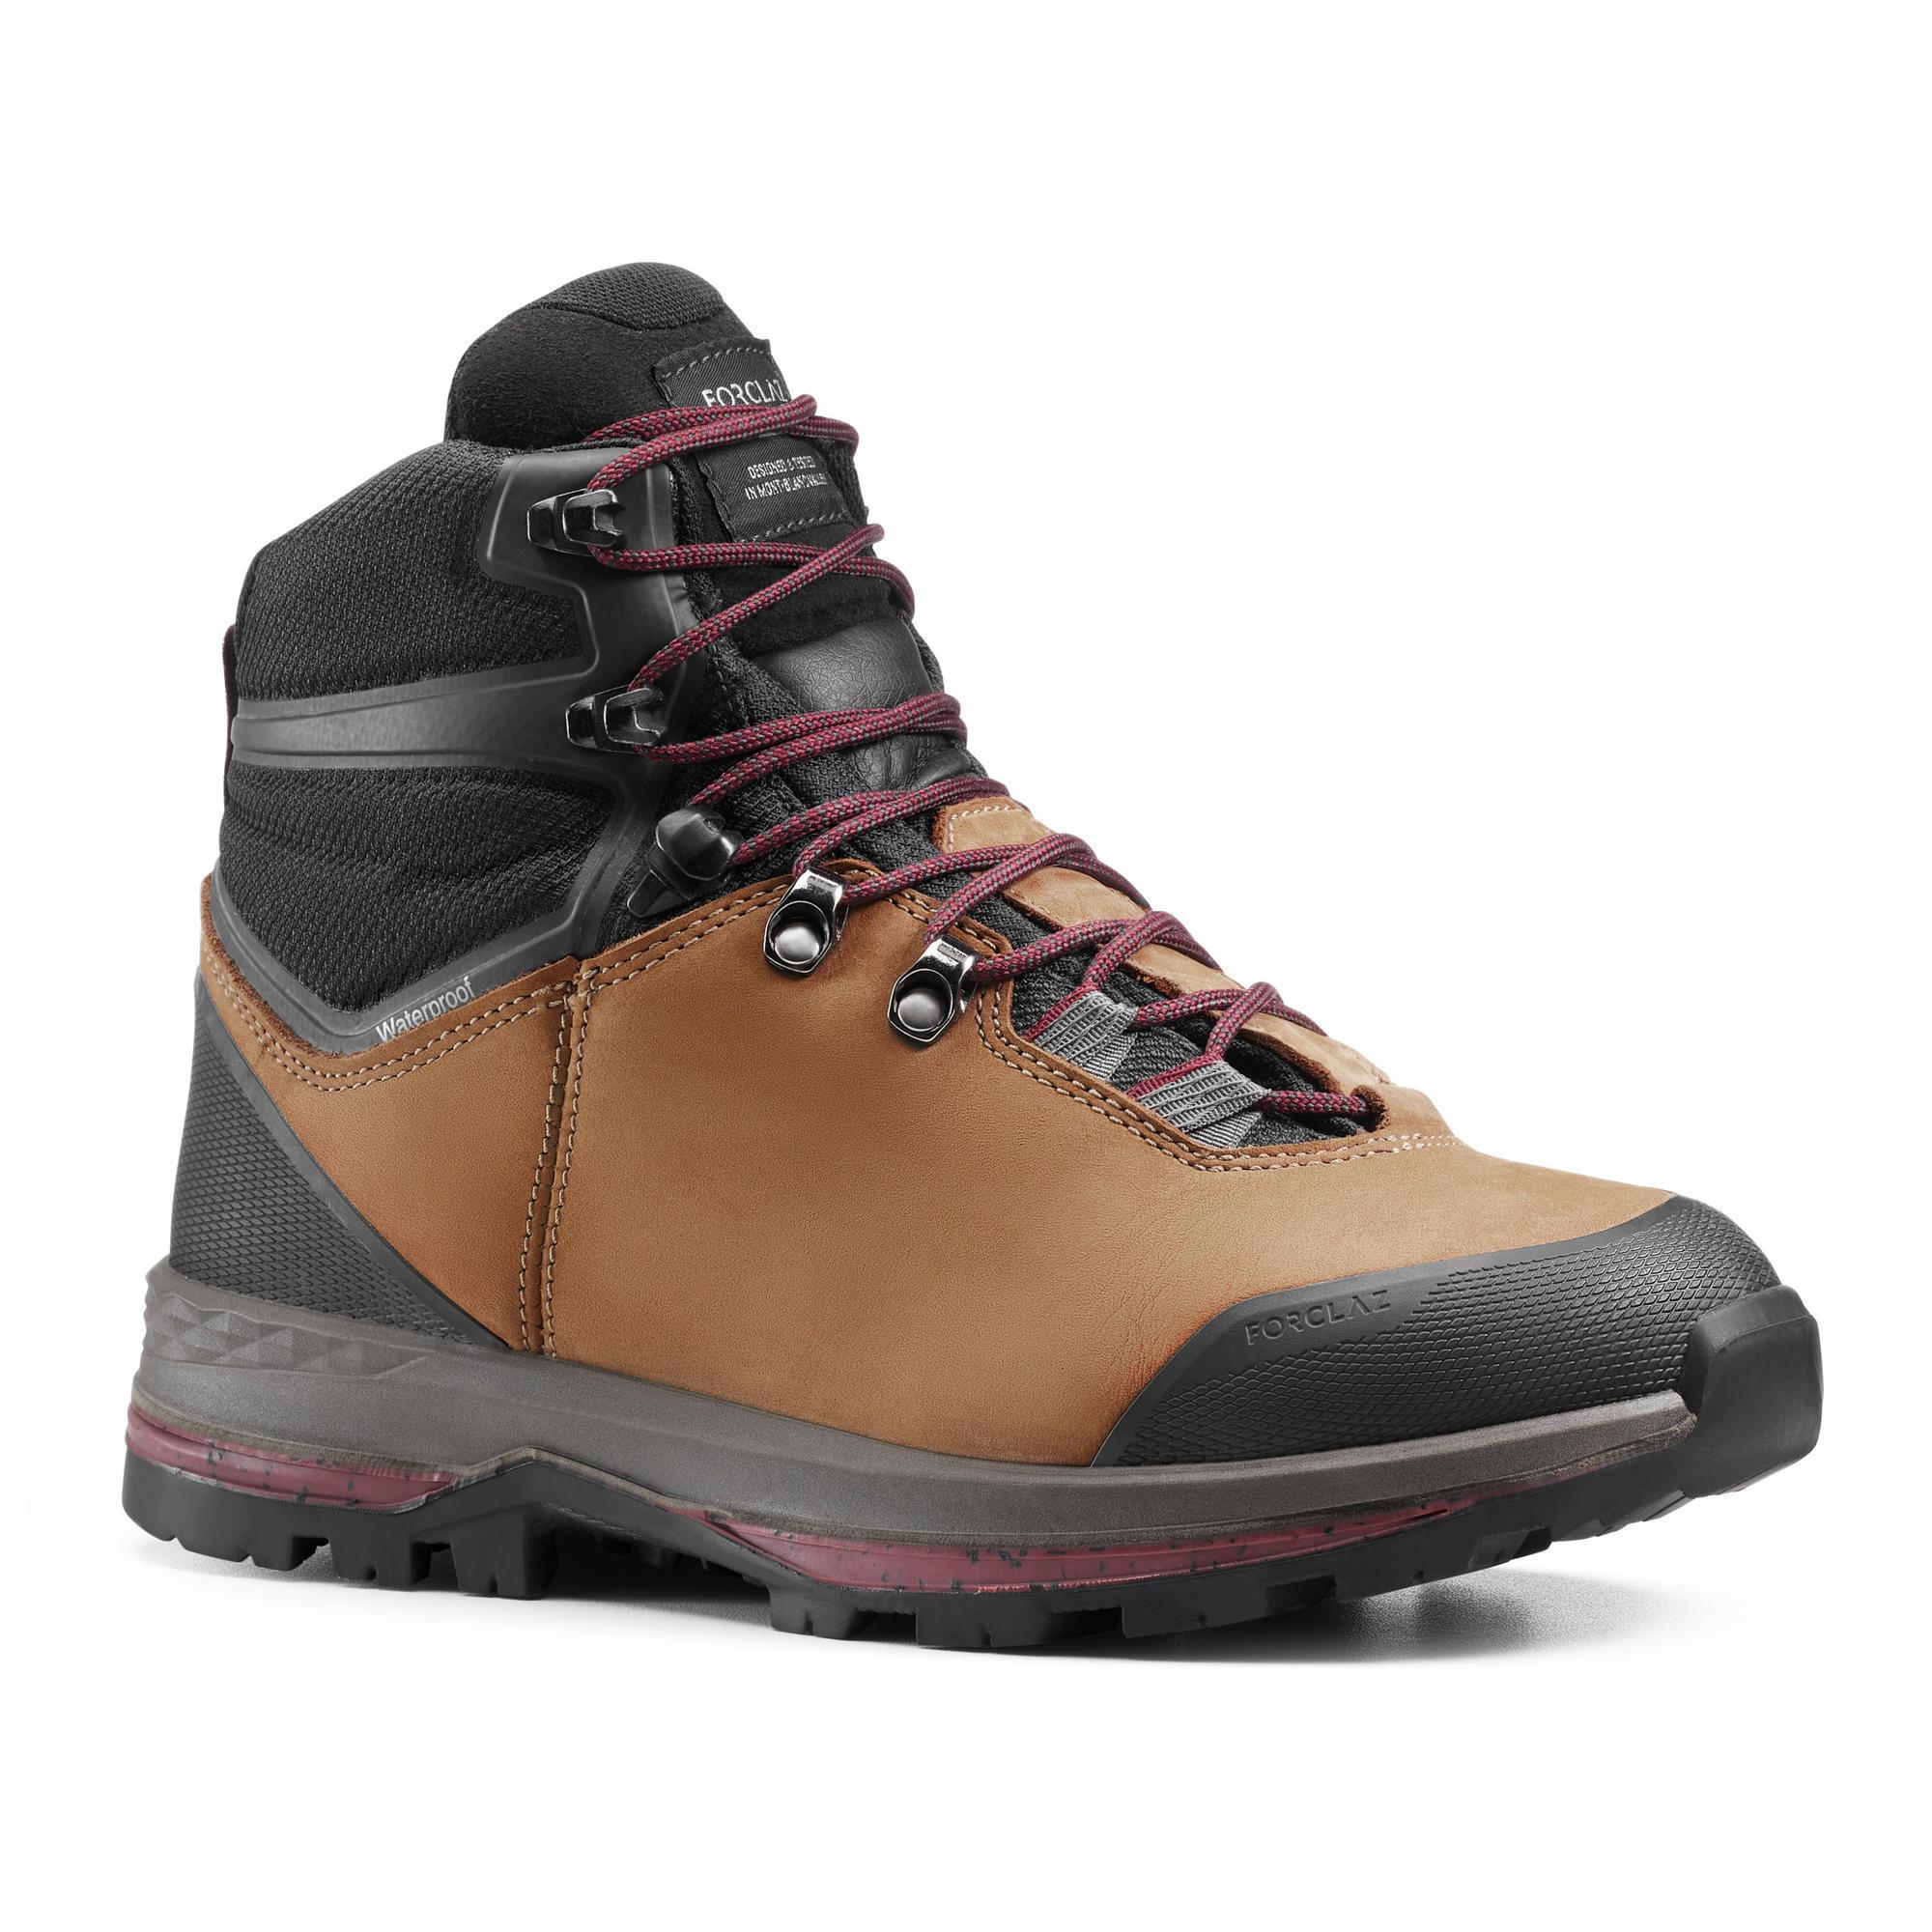 Chaussures de trekking montagne TREK100 cuir femme - Forclaz